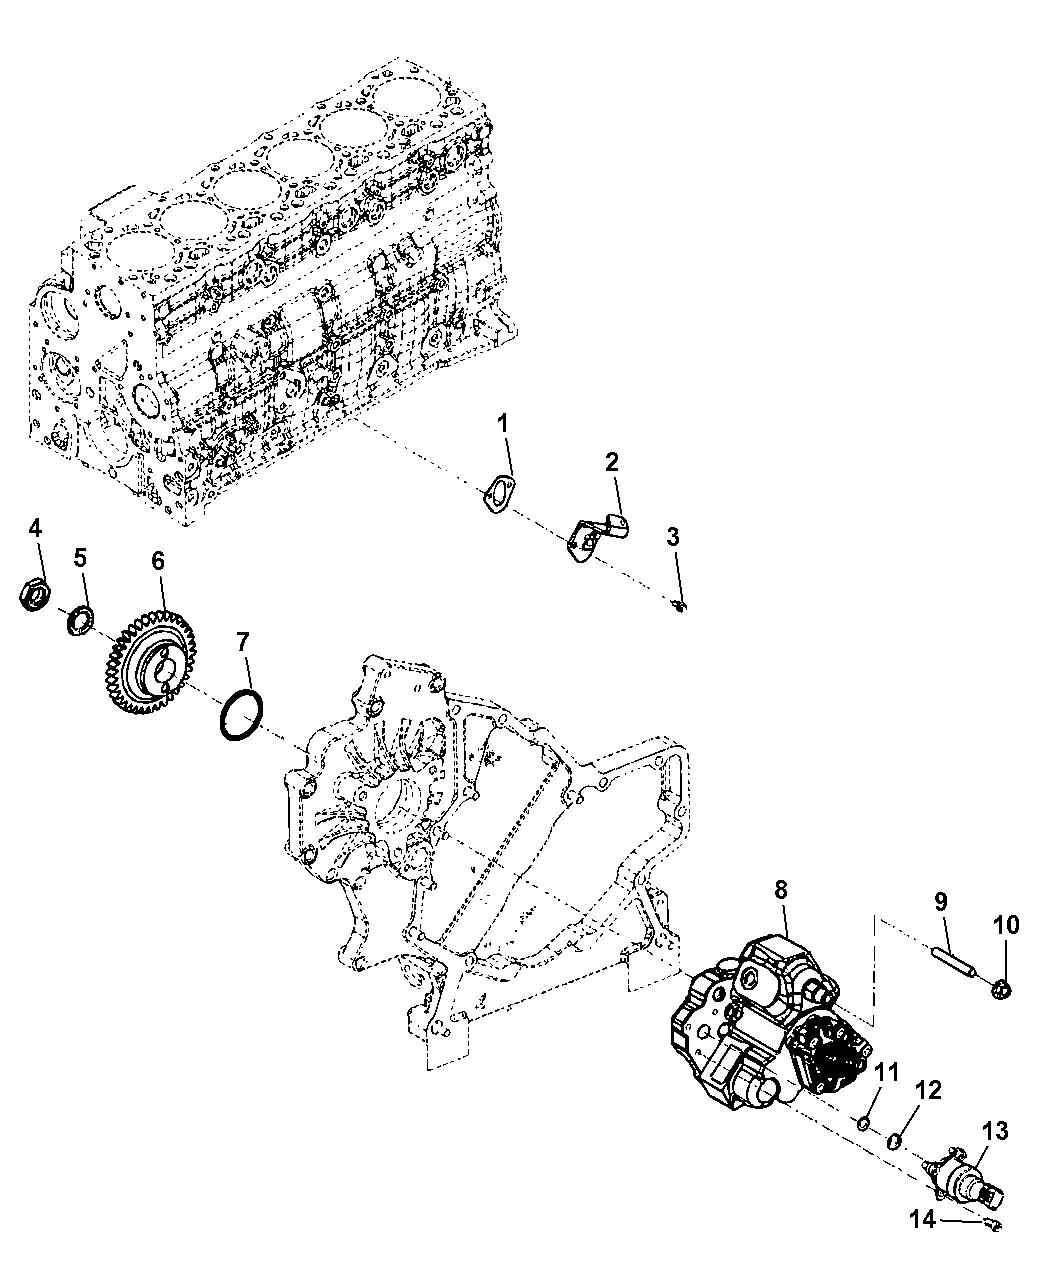 2010 Dodge Ram 3500 Pickup Fuel Injection Pump Filter Location